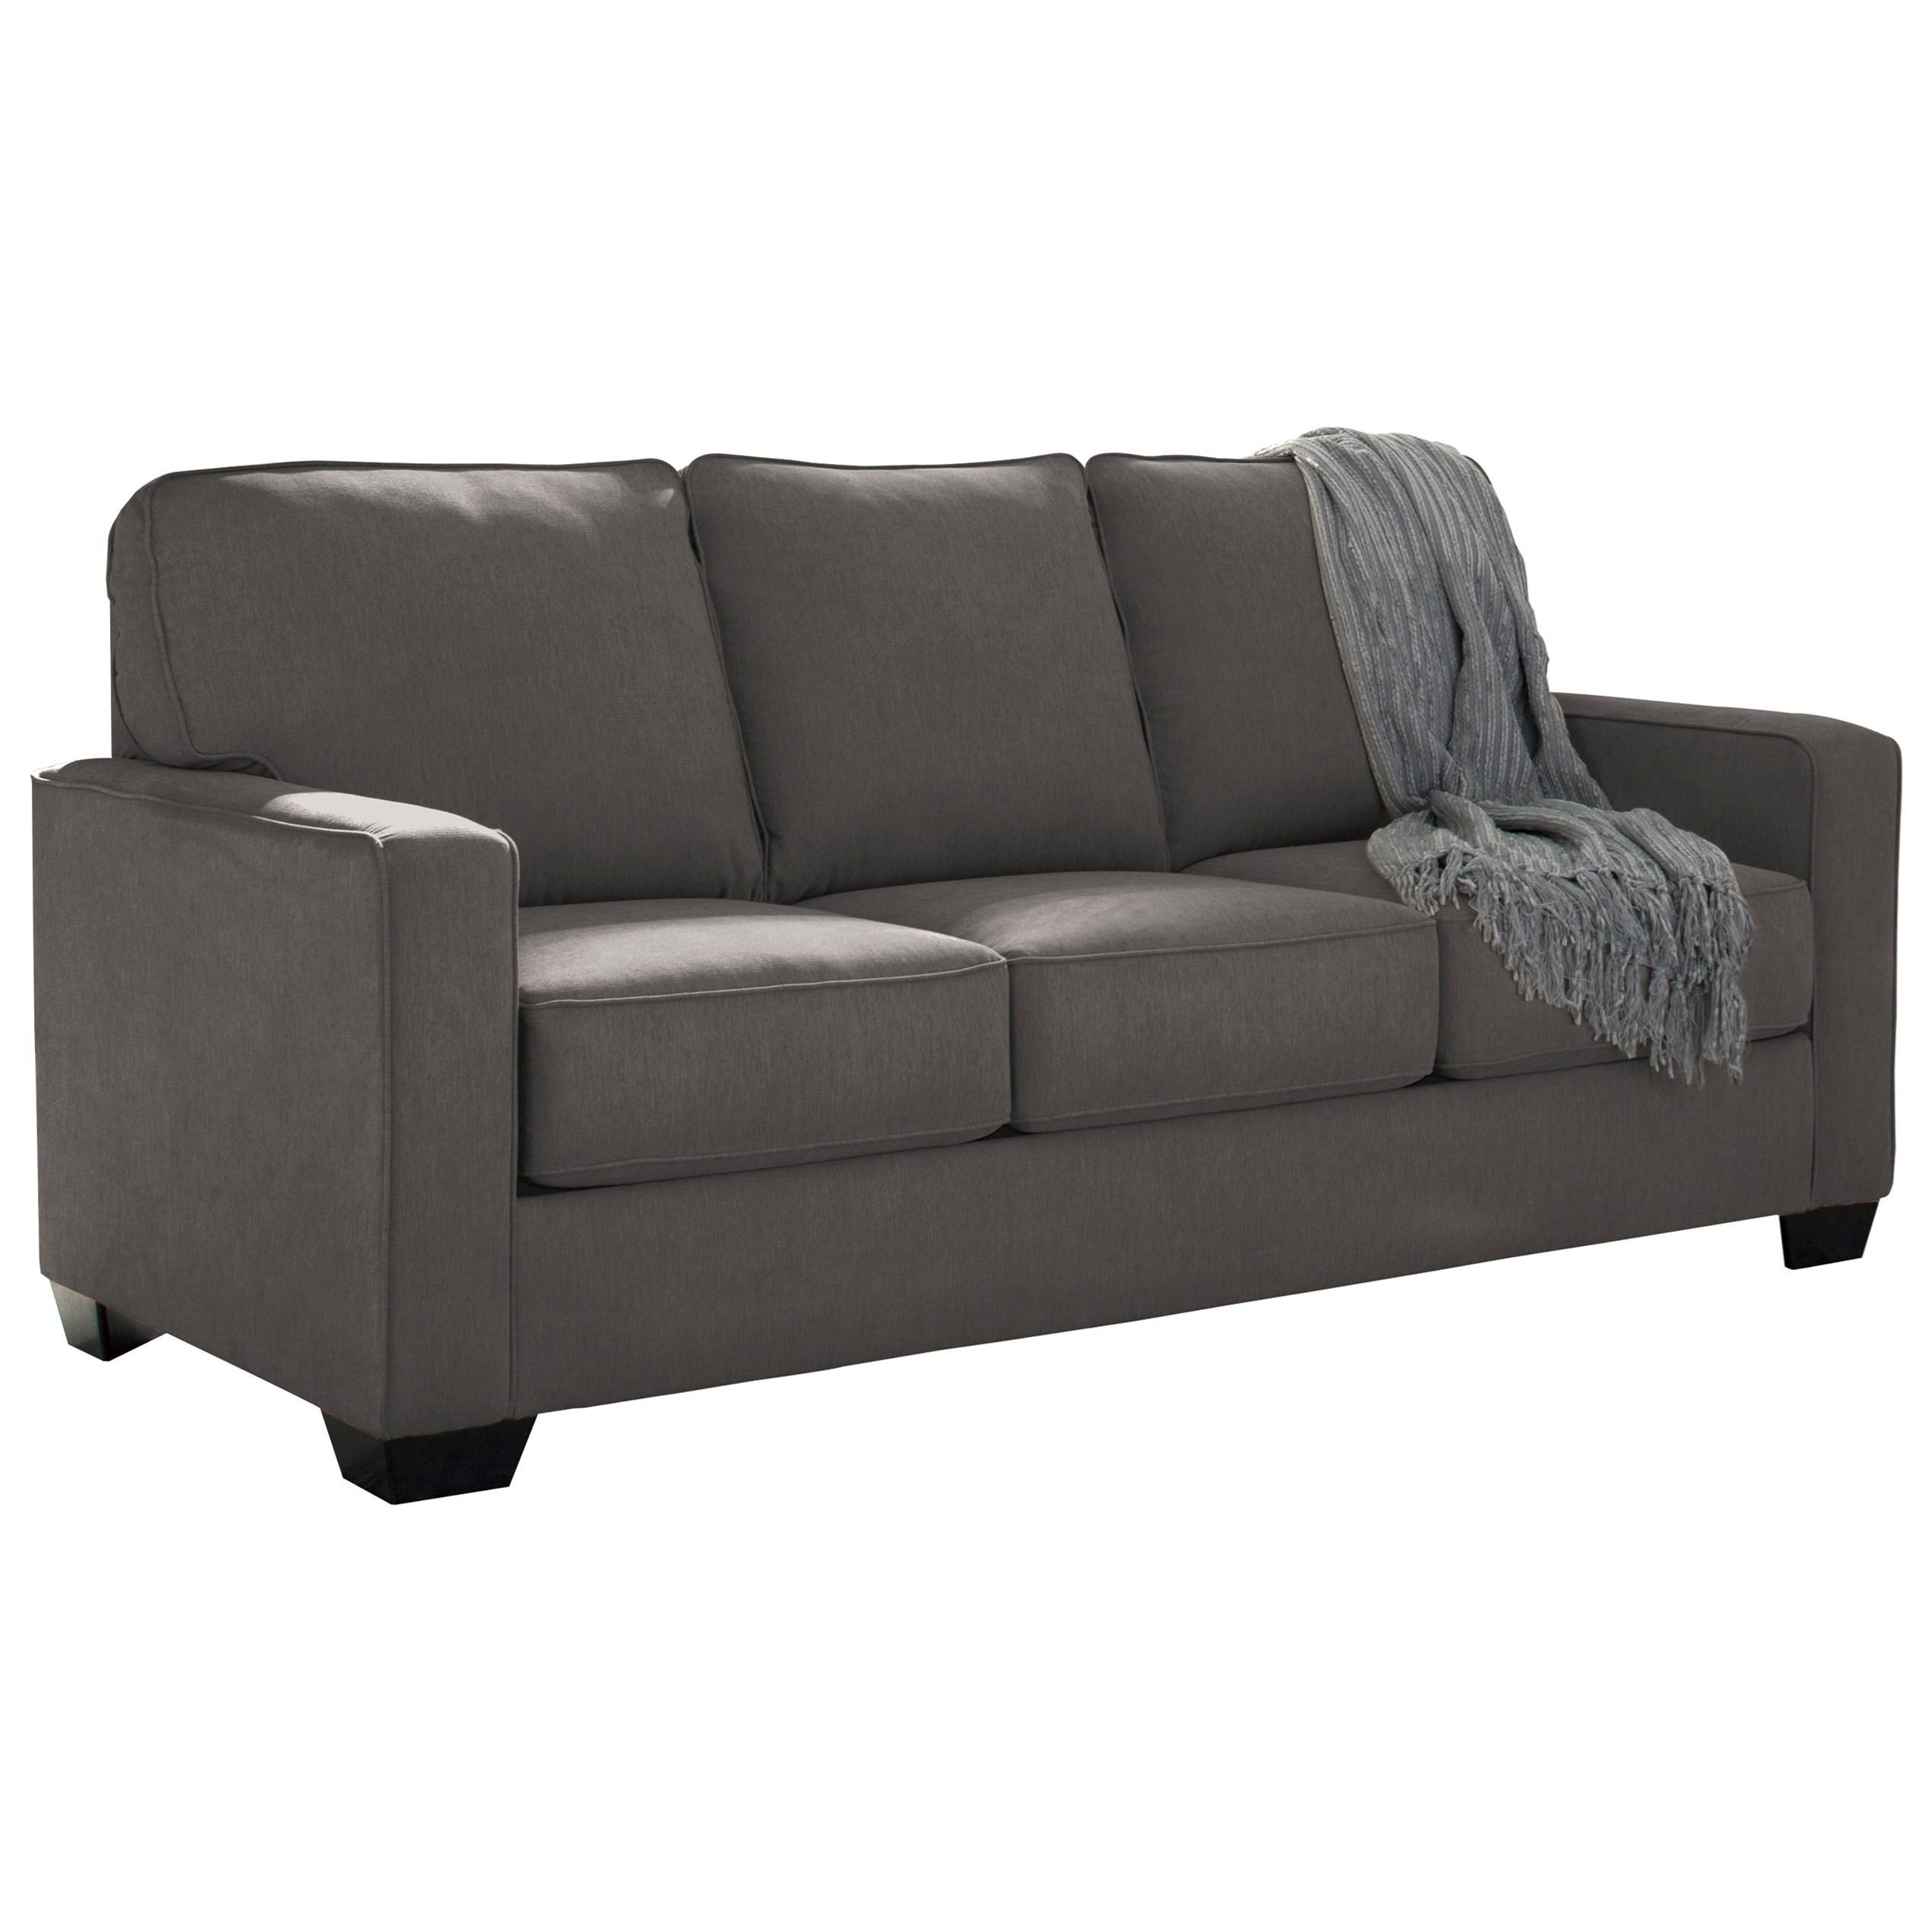 sleeper chair folding foam bed full size high adirondack chairs sofa brilliant queen